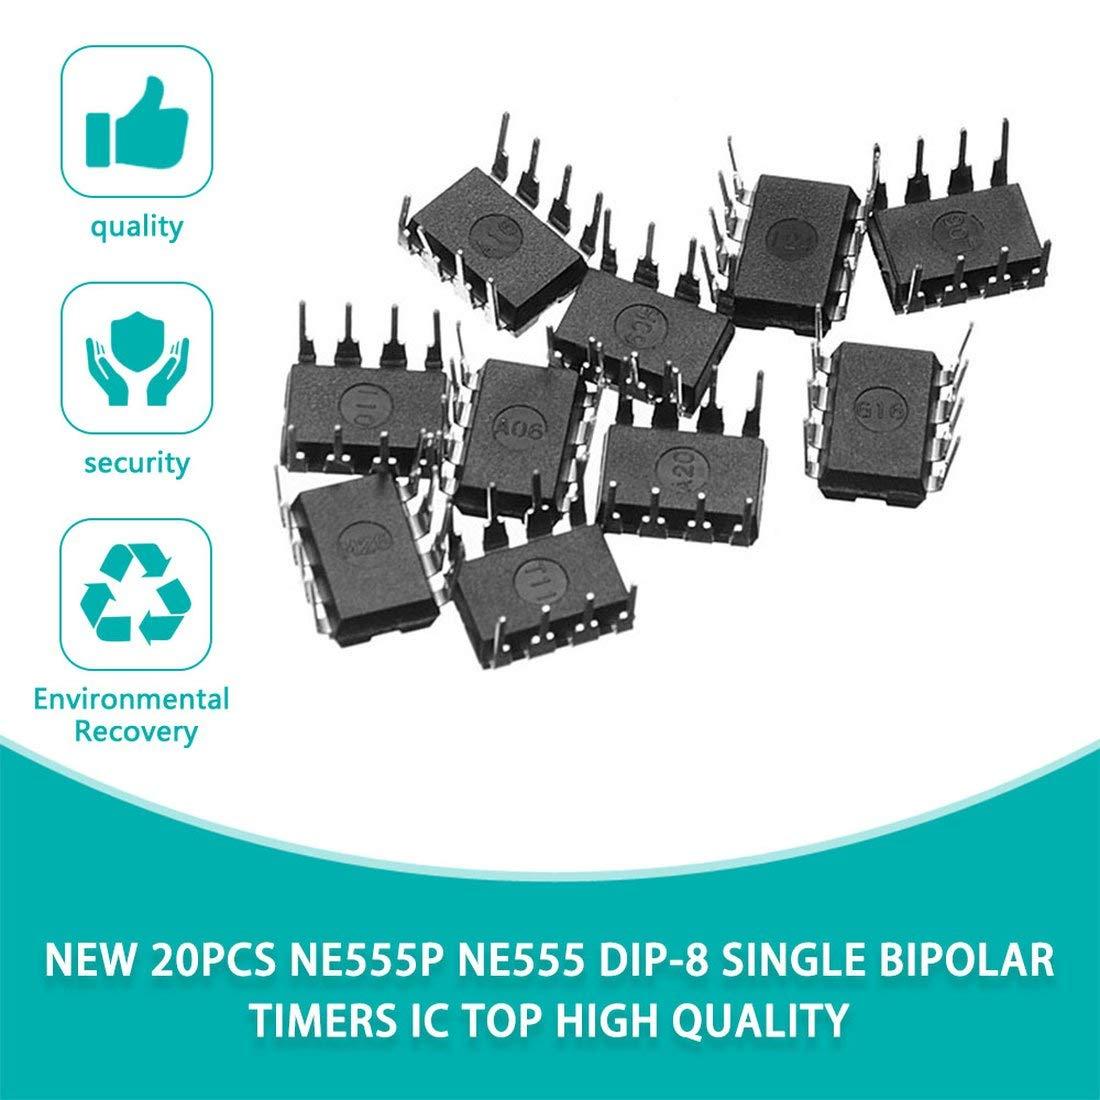 negro Nuevo 20PCS NE555P NE555 DIP-8 TEMPORIZADORES BIPOLARES SIMPLES IC TOP de alta calidad